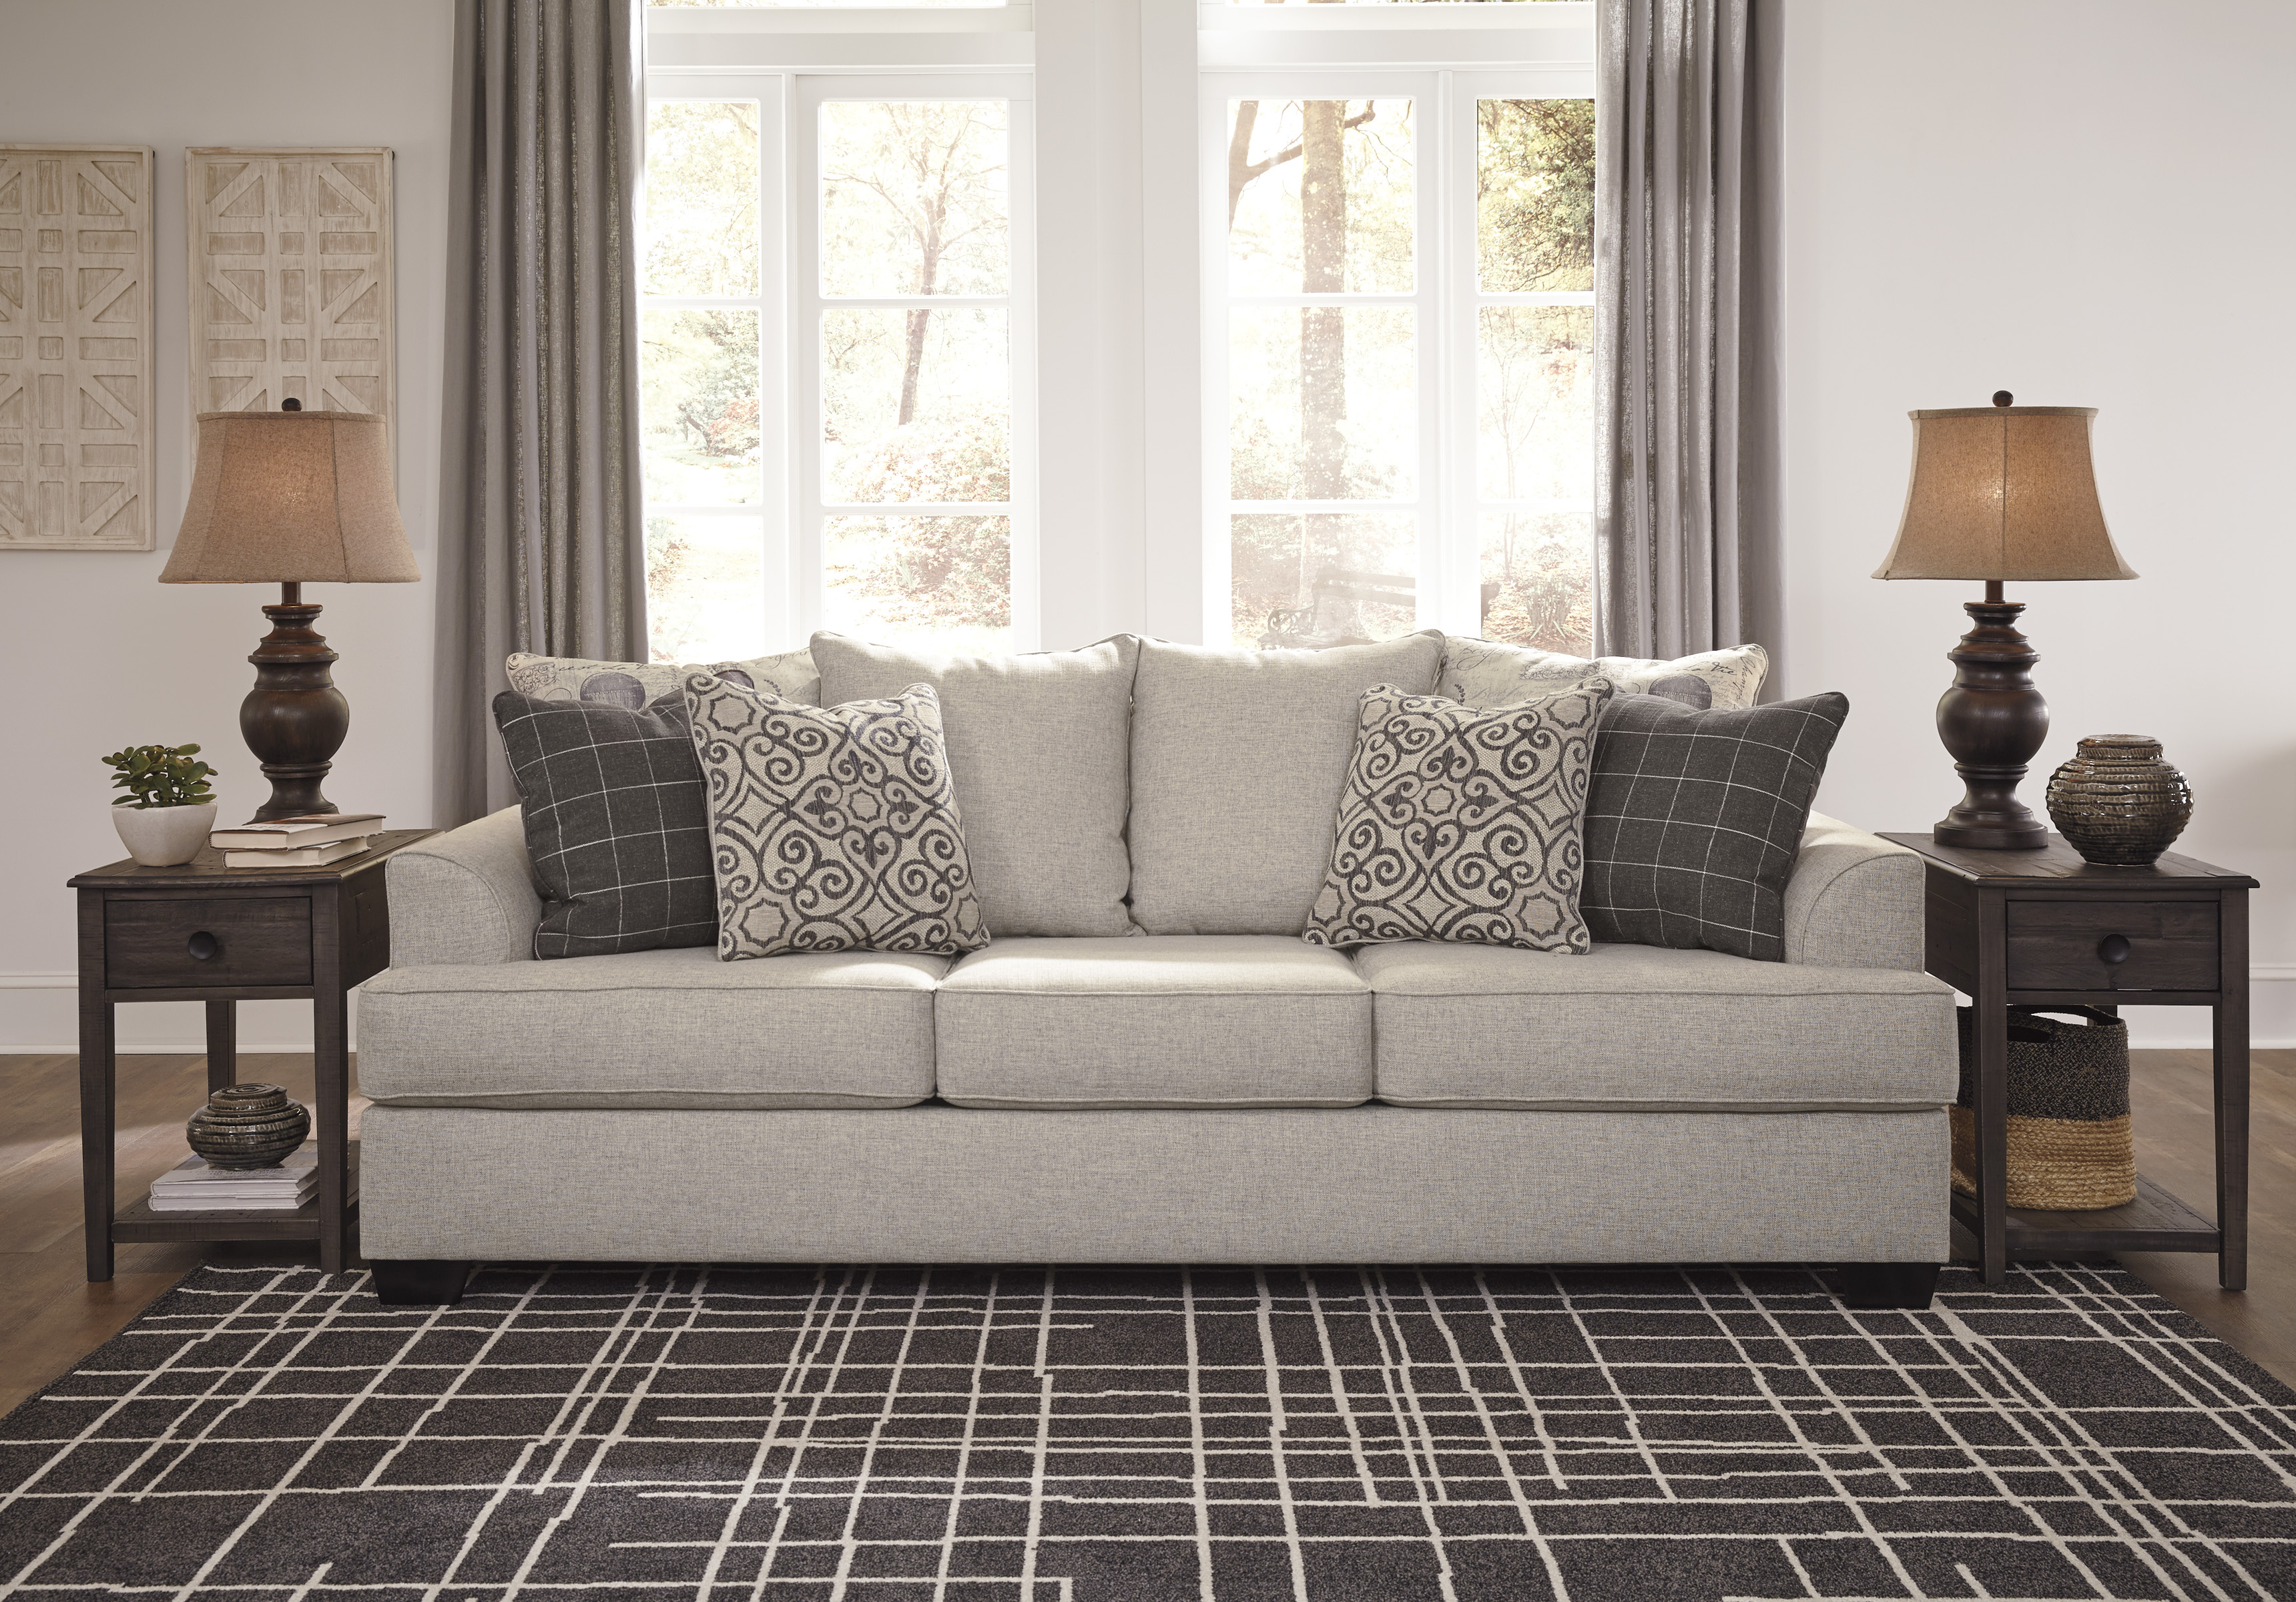 Velletri Living Room All American Furniture Buy 4 Less